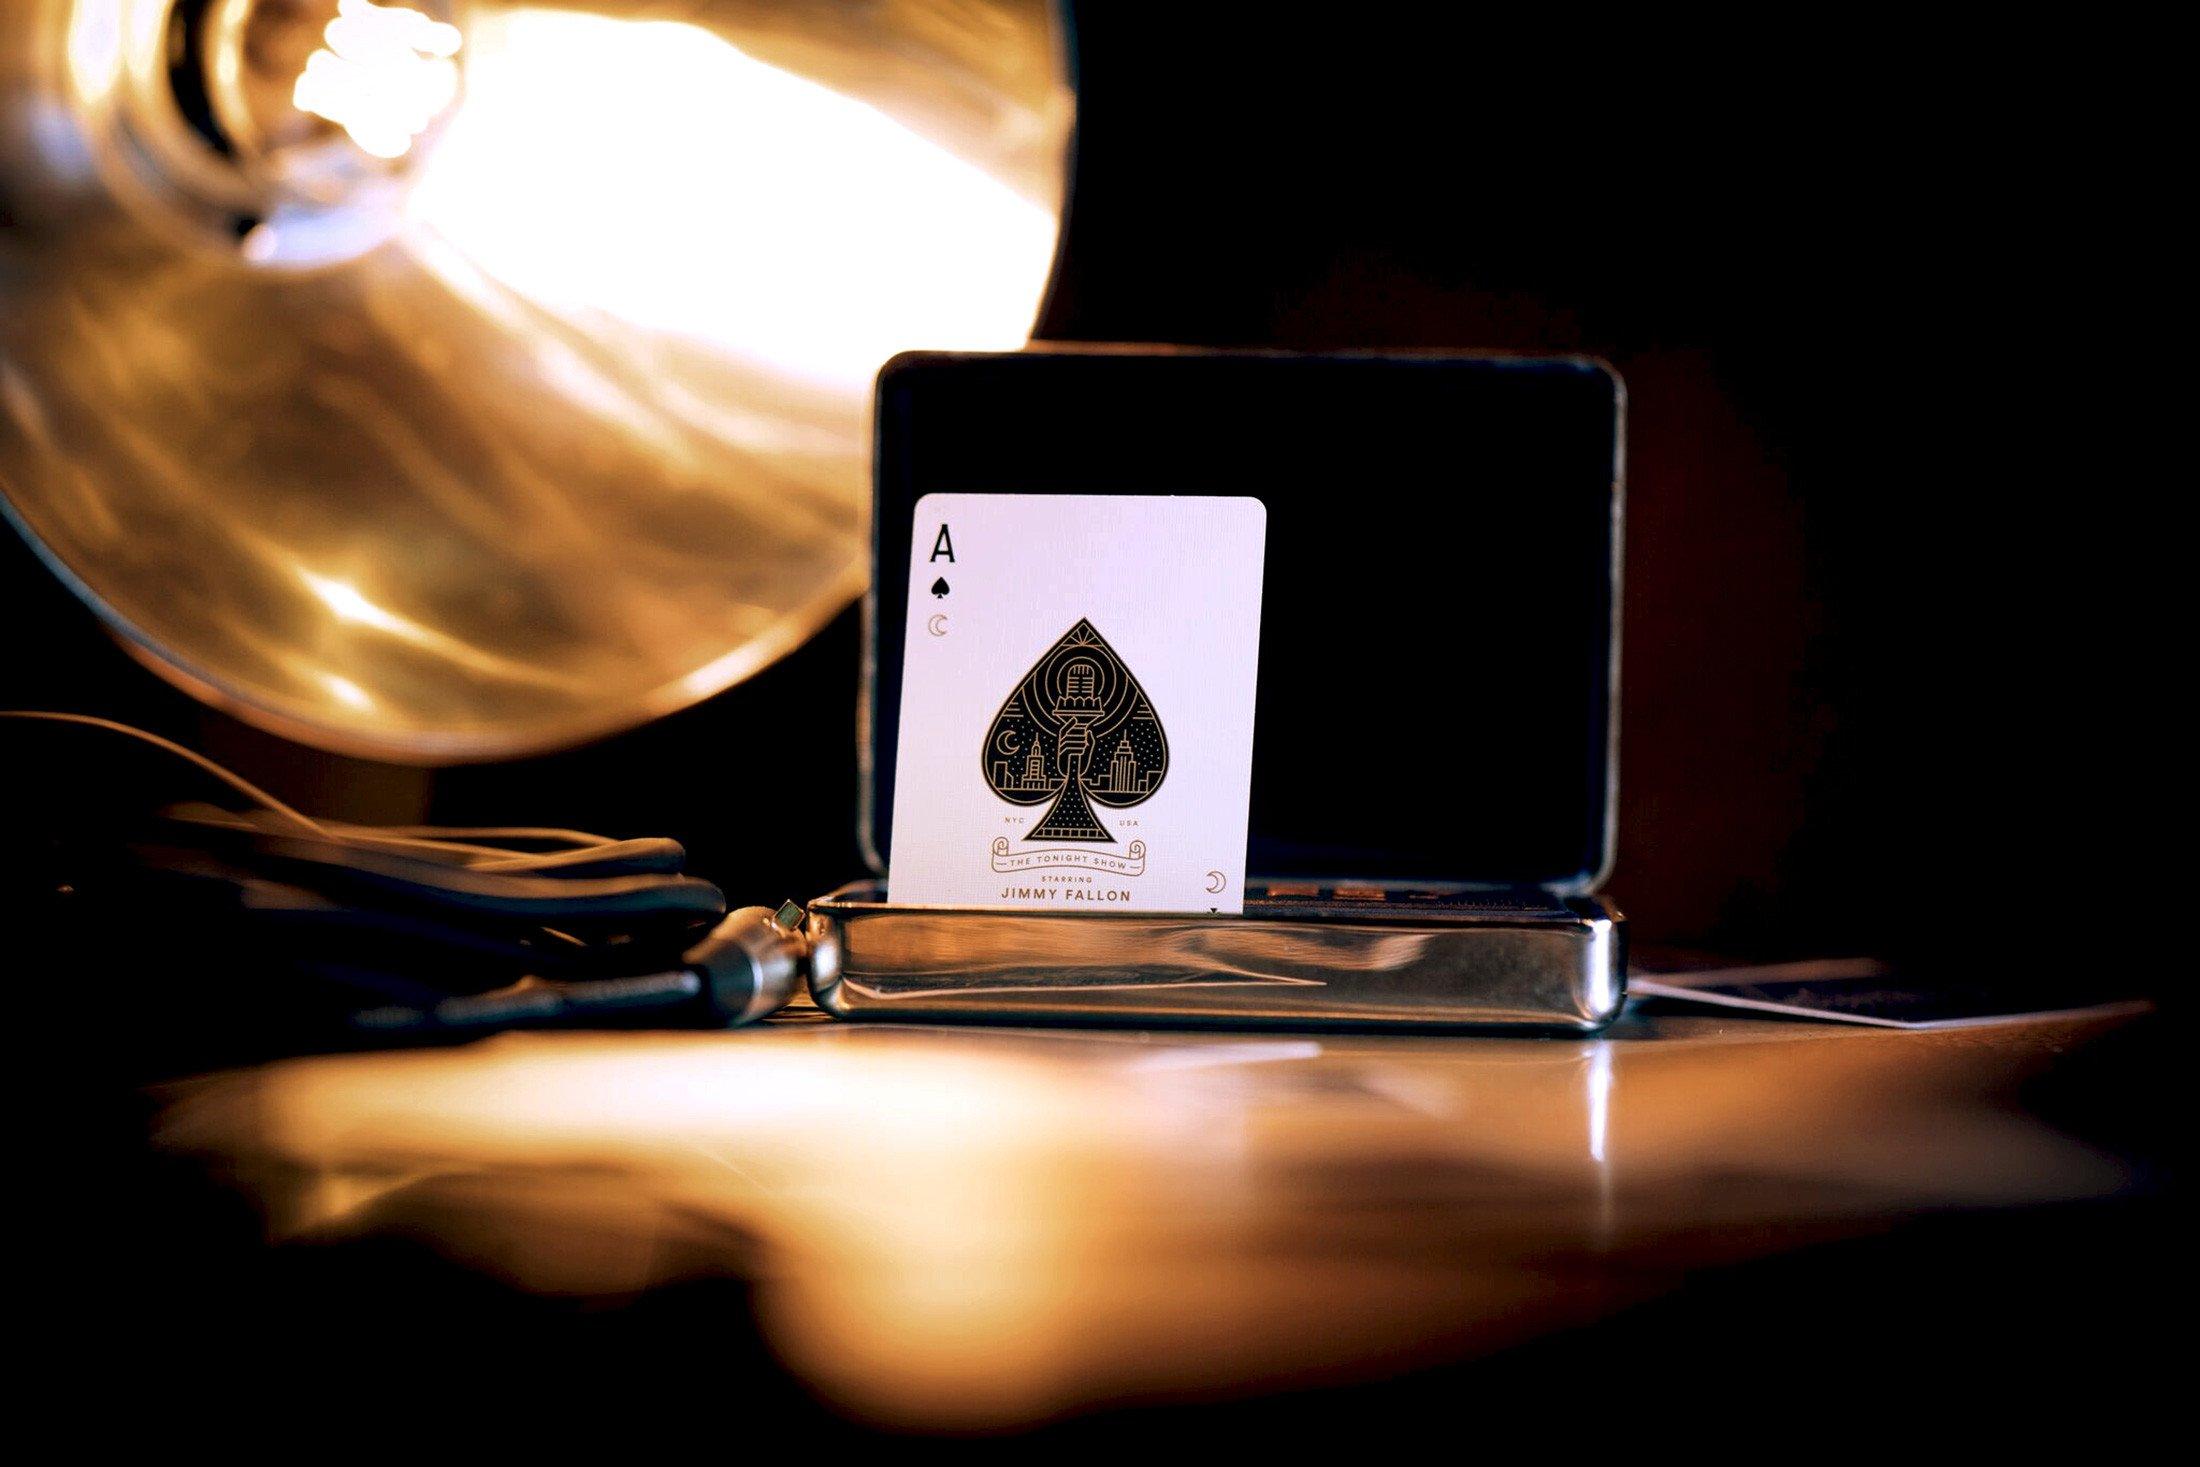 jimmy-fallon-playing-cards-08.jpg